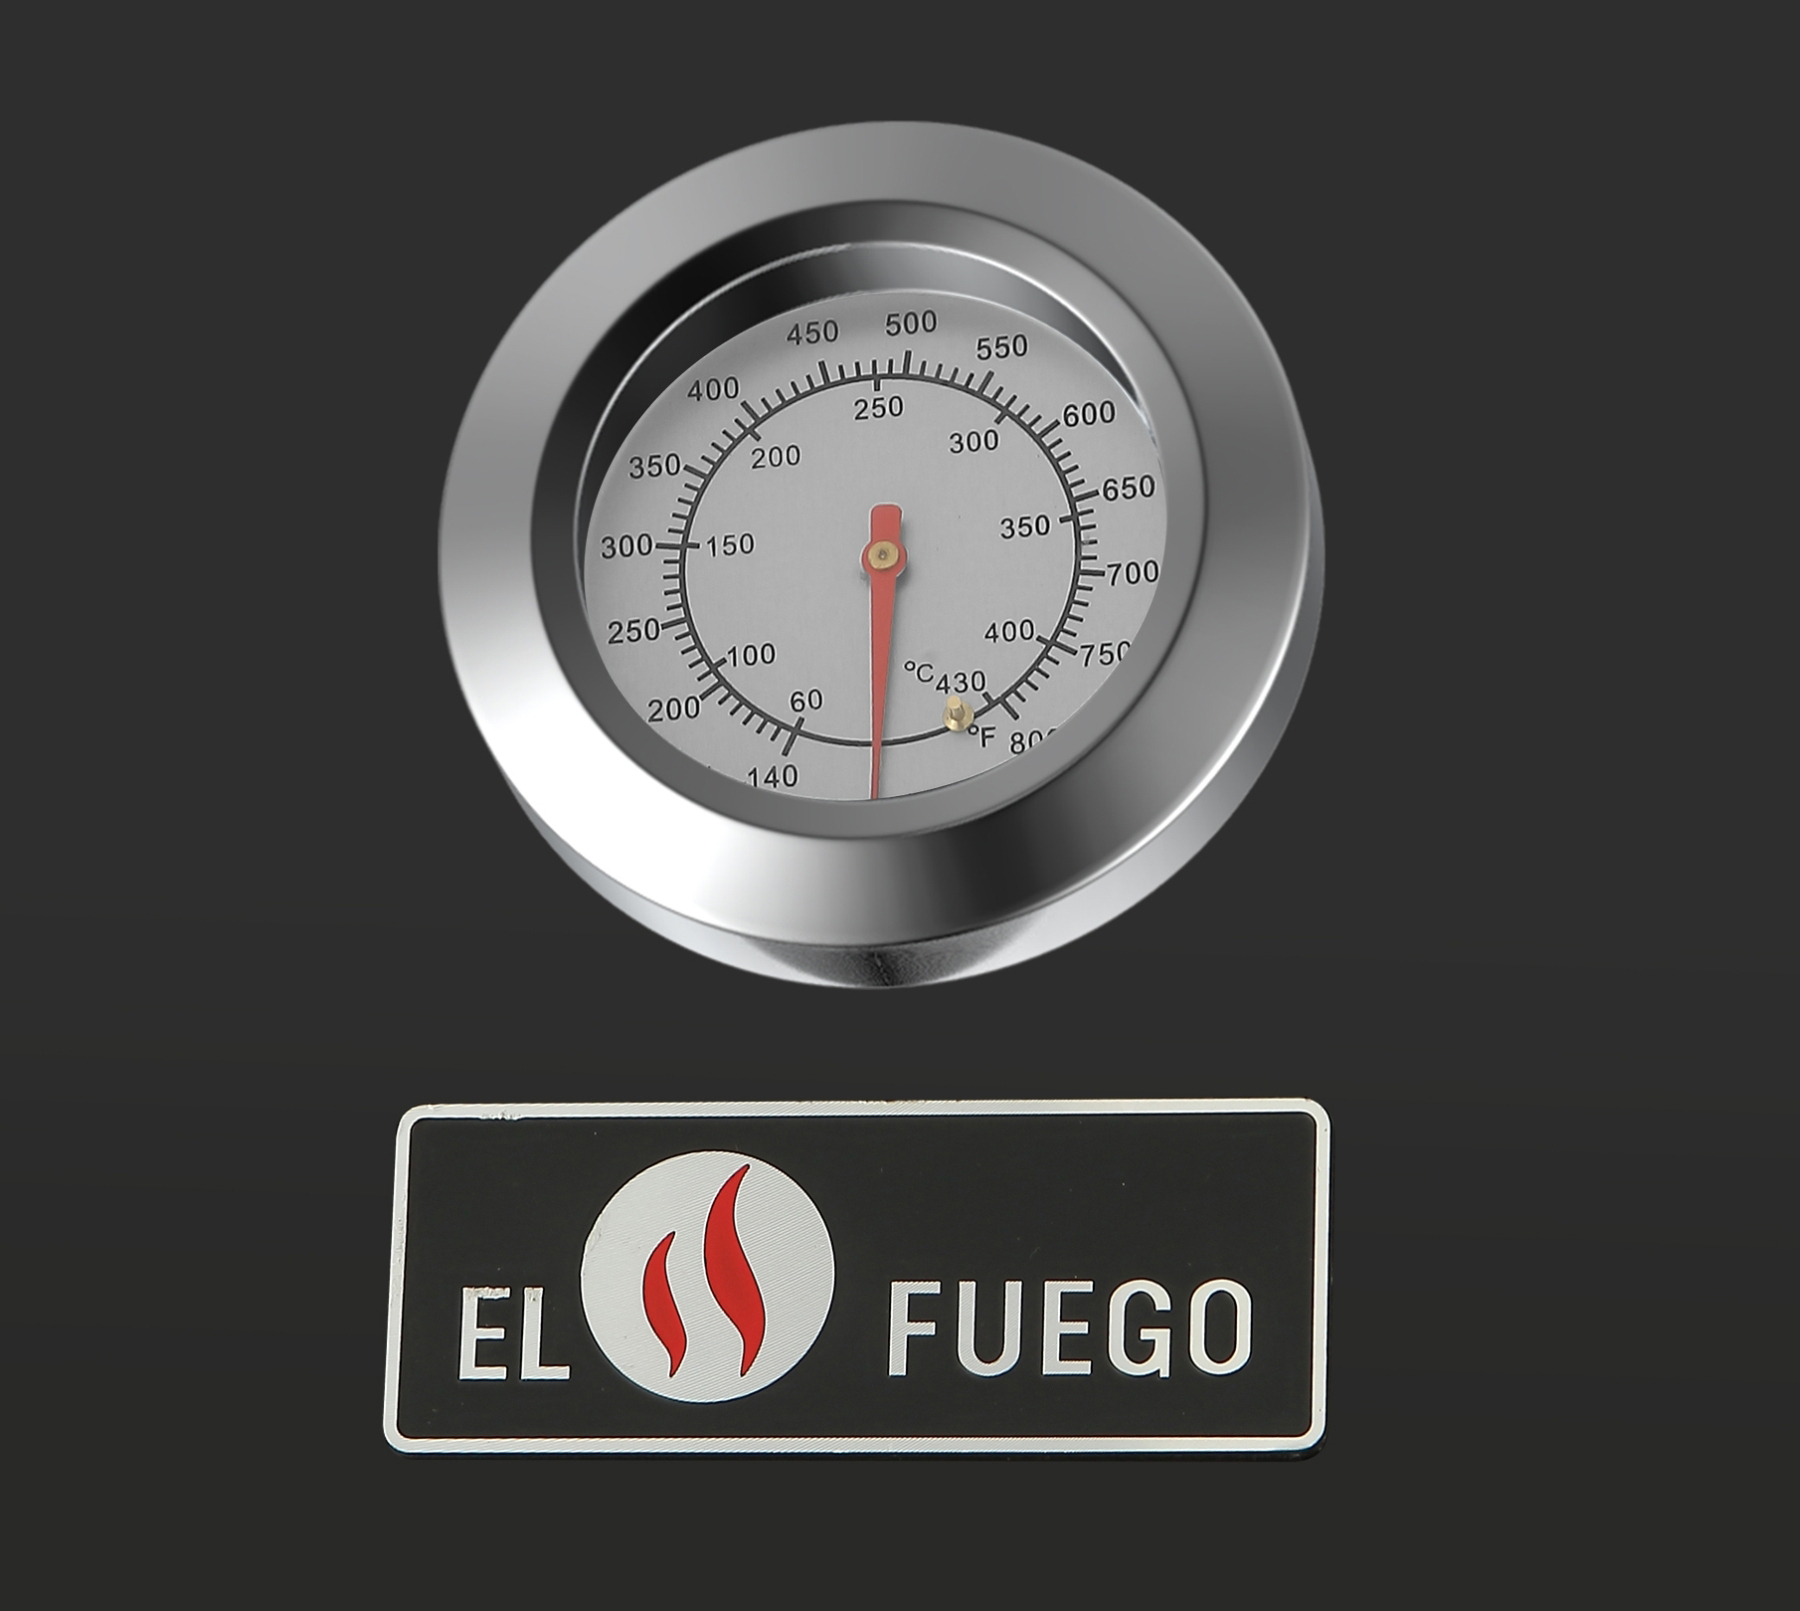 El Fuego Gasgrill / Grillwagen Brookline 3+1 Grillfläche 60x42cm Bild 8